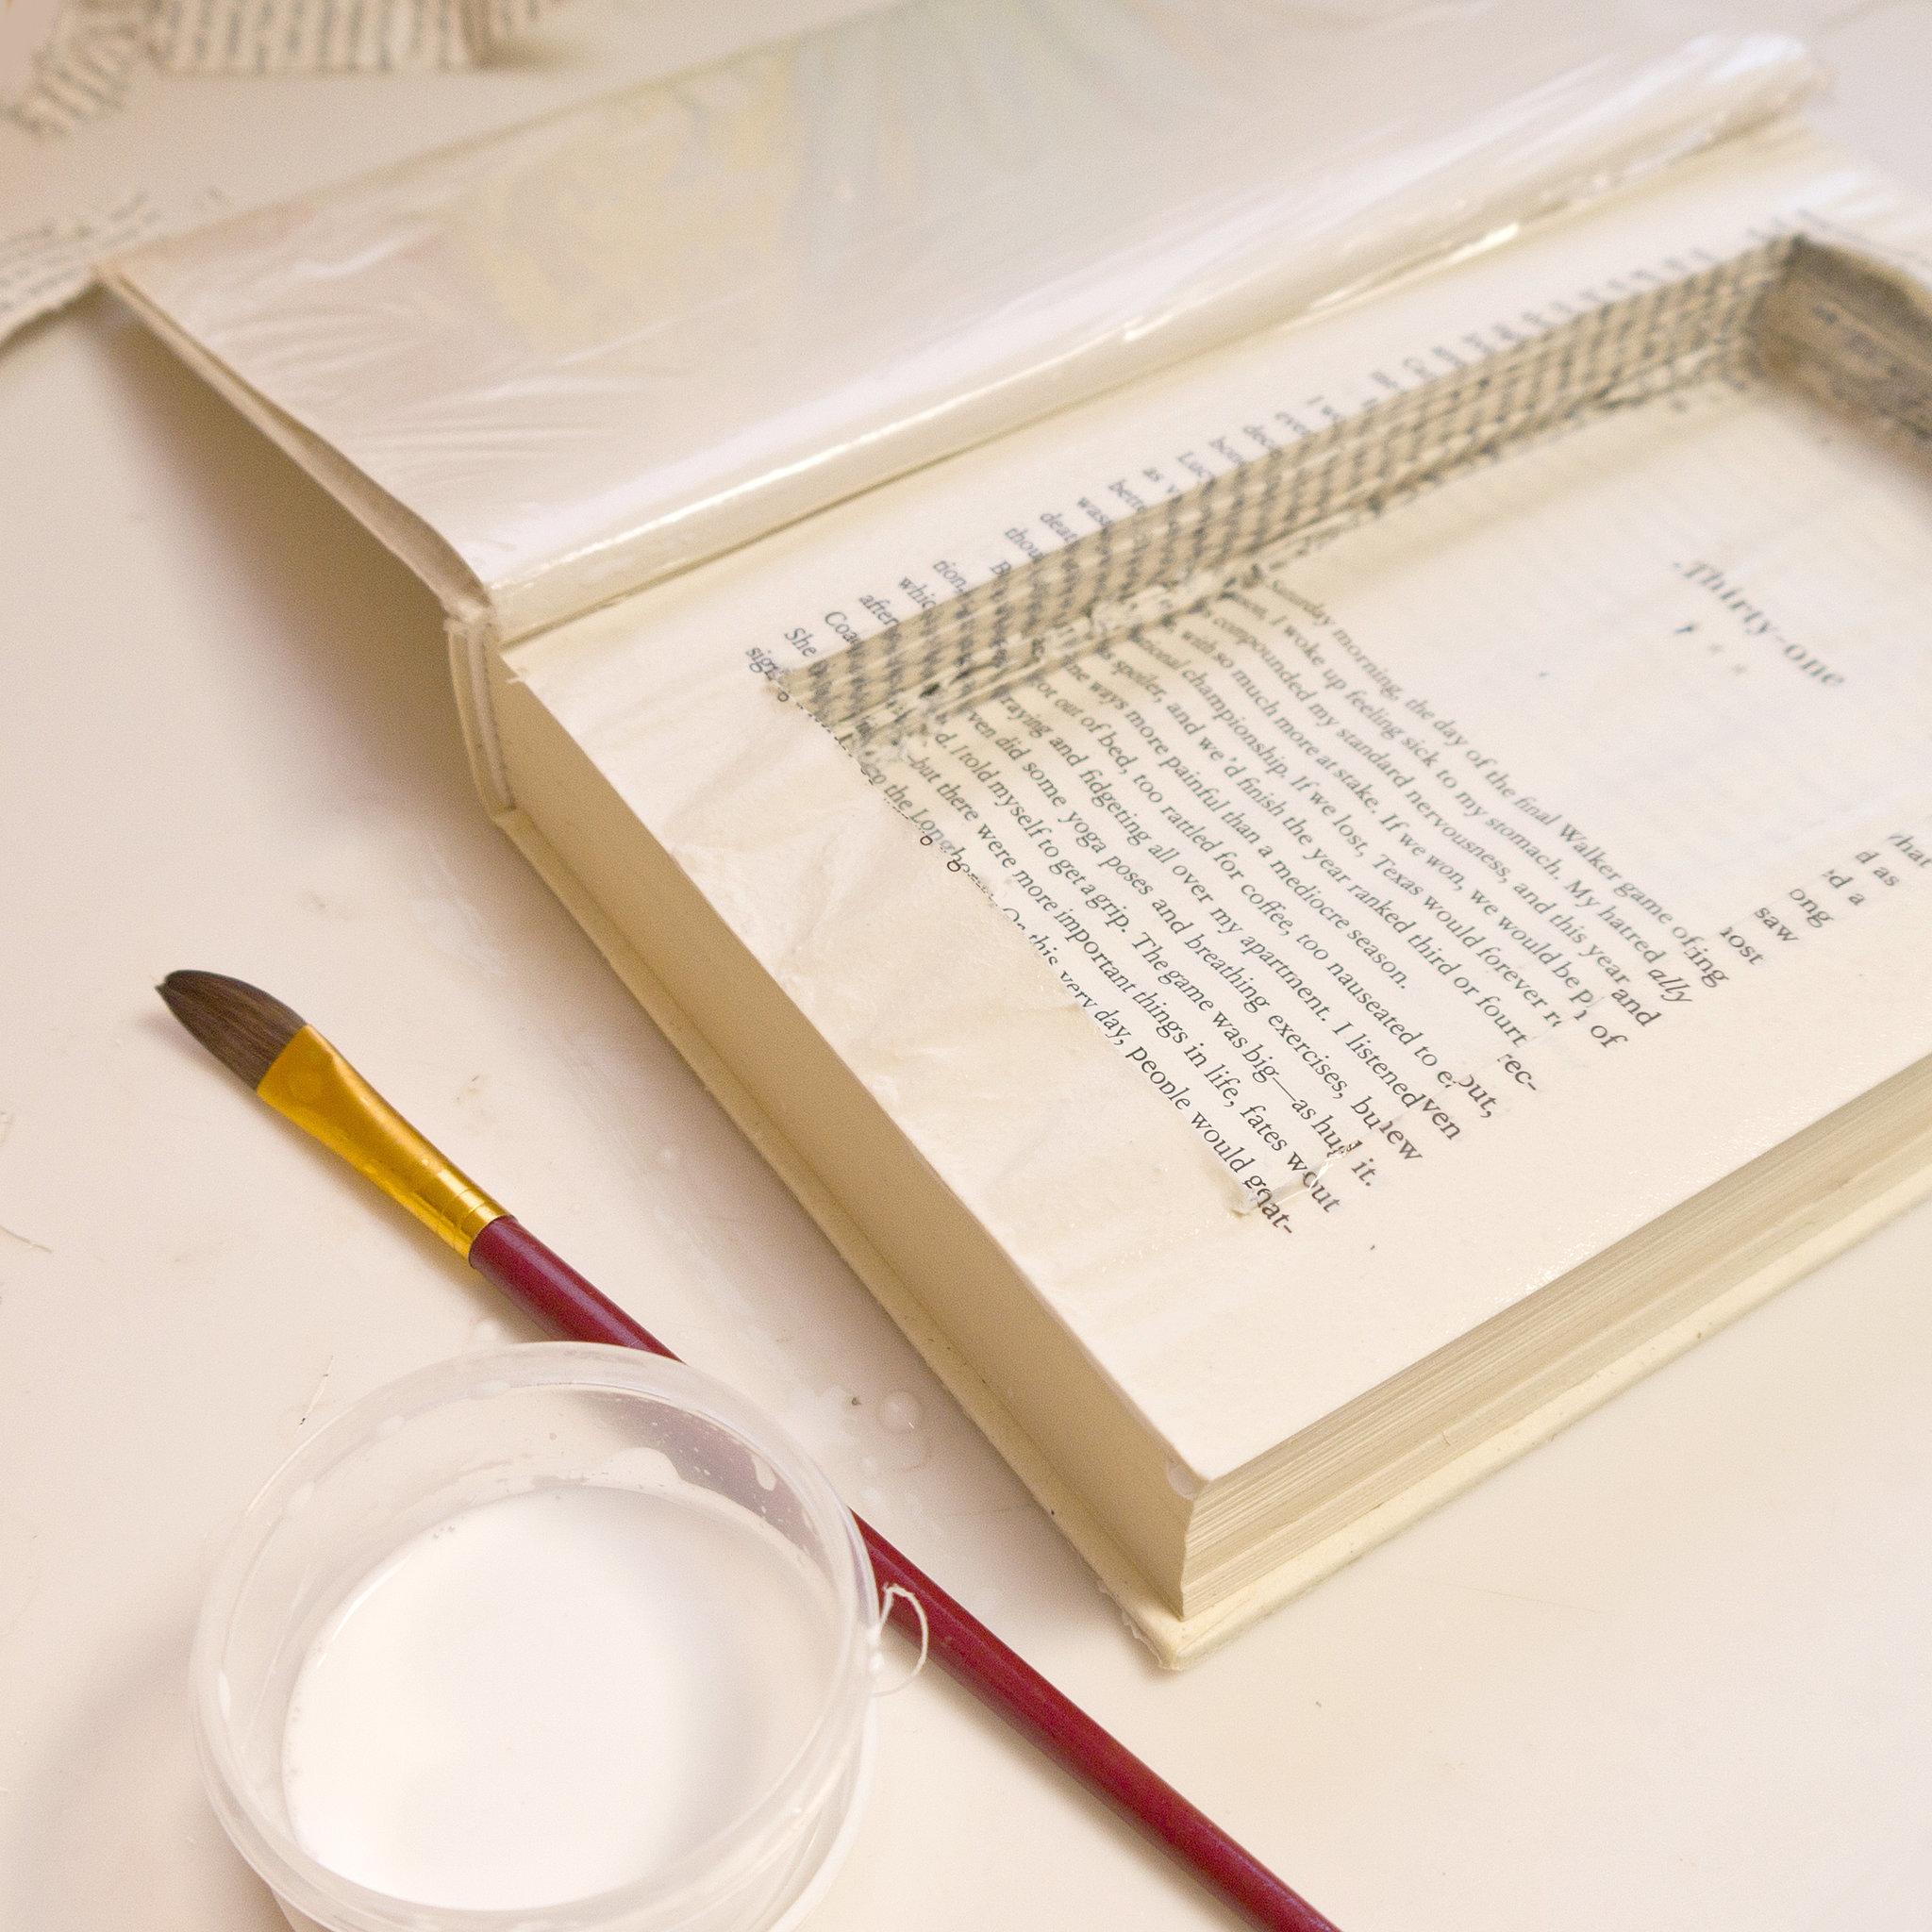 DIY Stash Book | POPSUGAR Smart Living